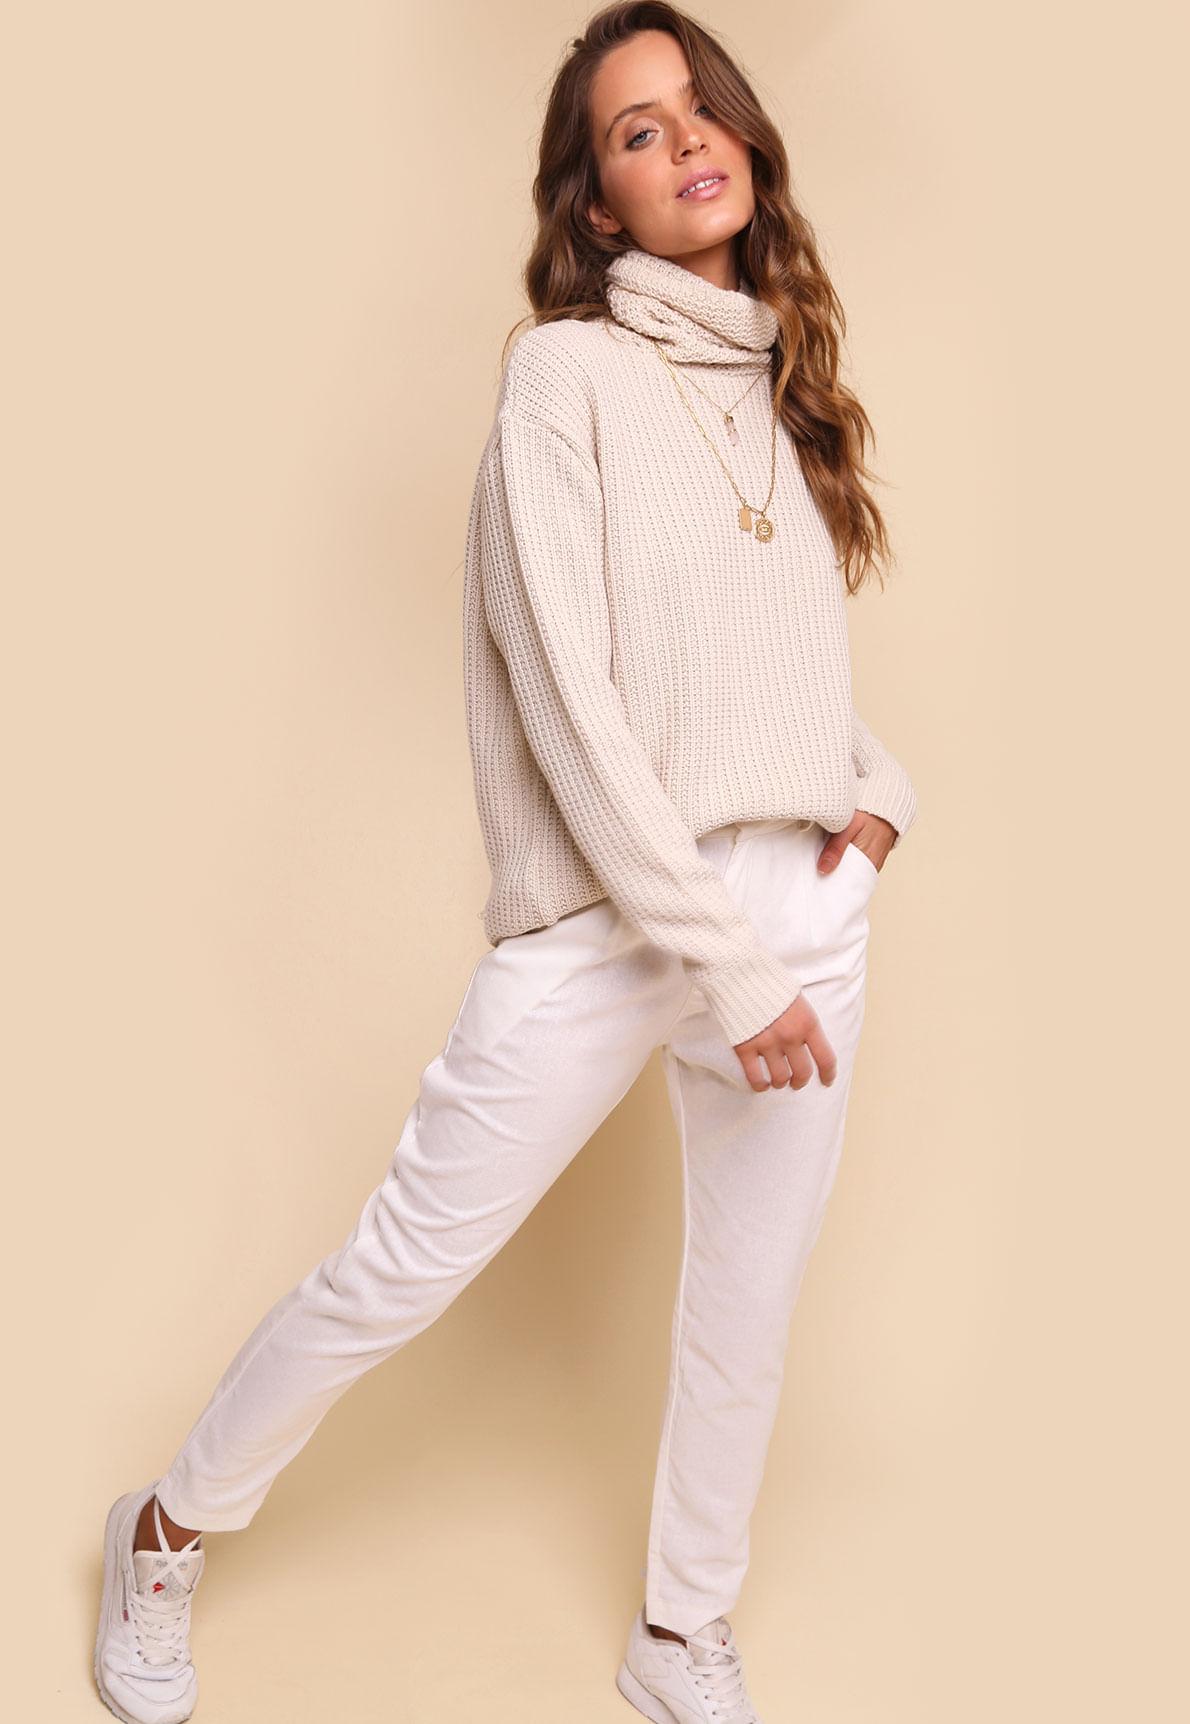 30688-calca-alfaiataria-off-white-laila-mundo-lolita-01